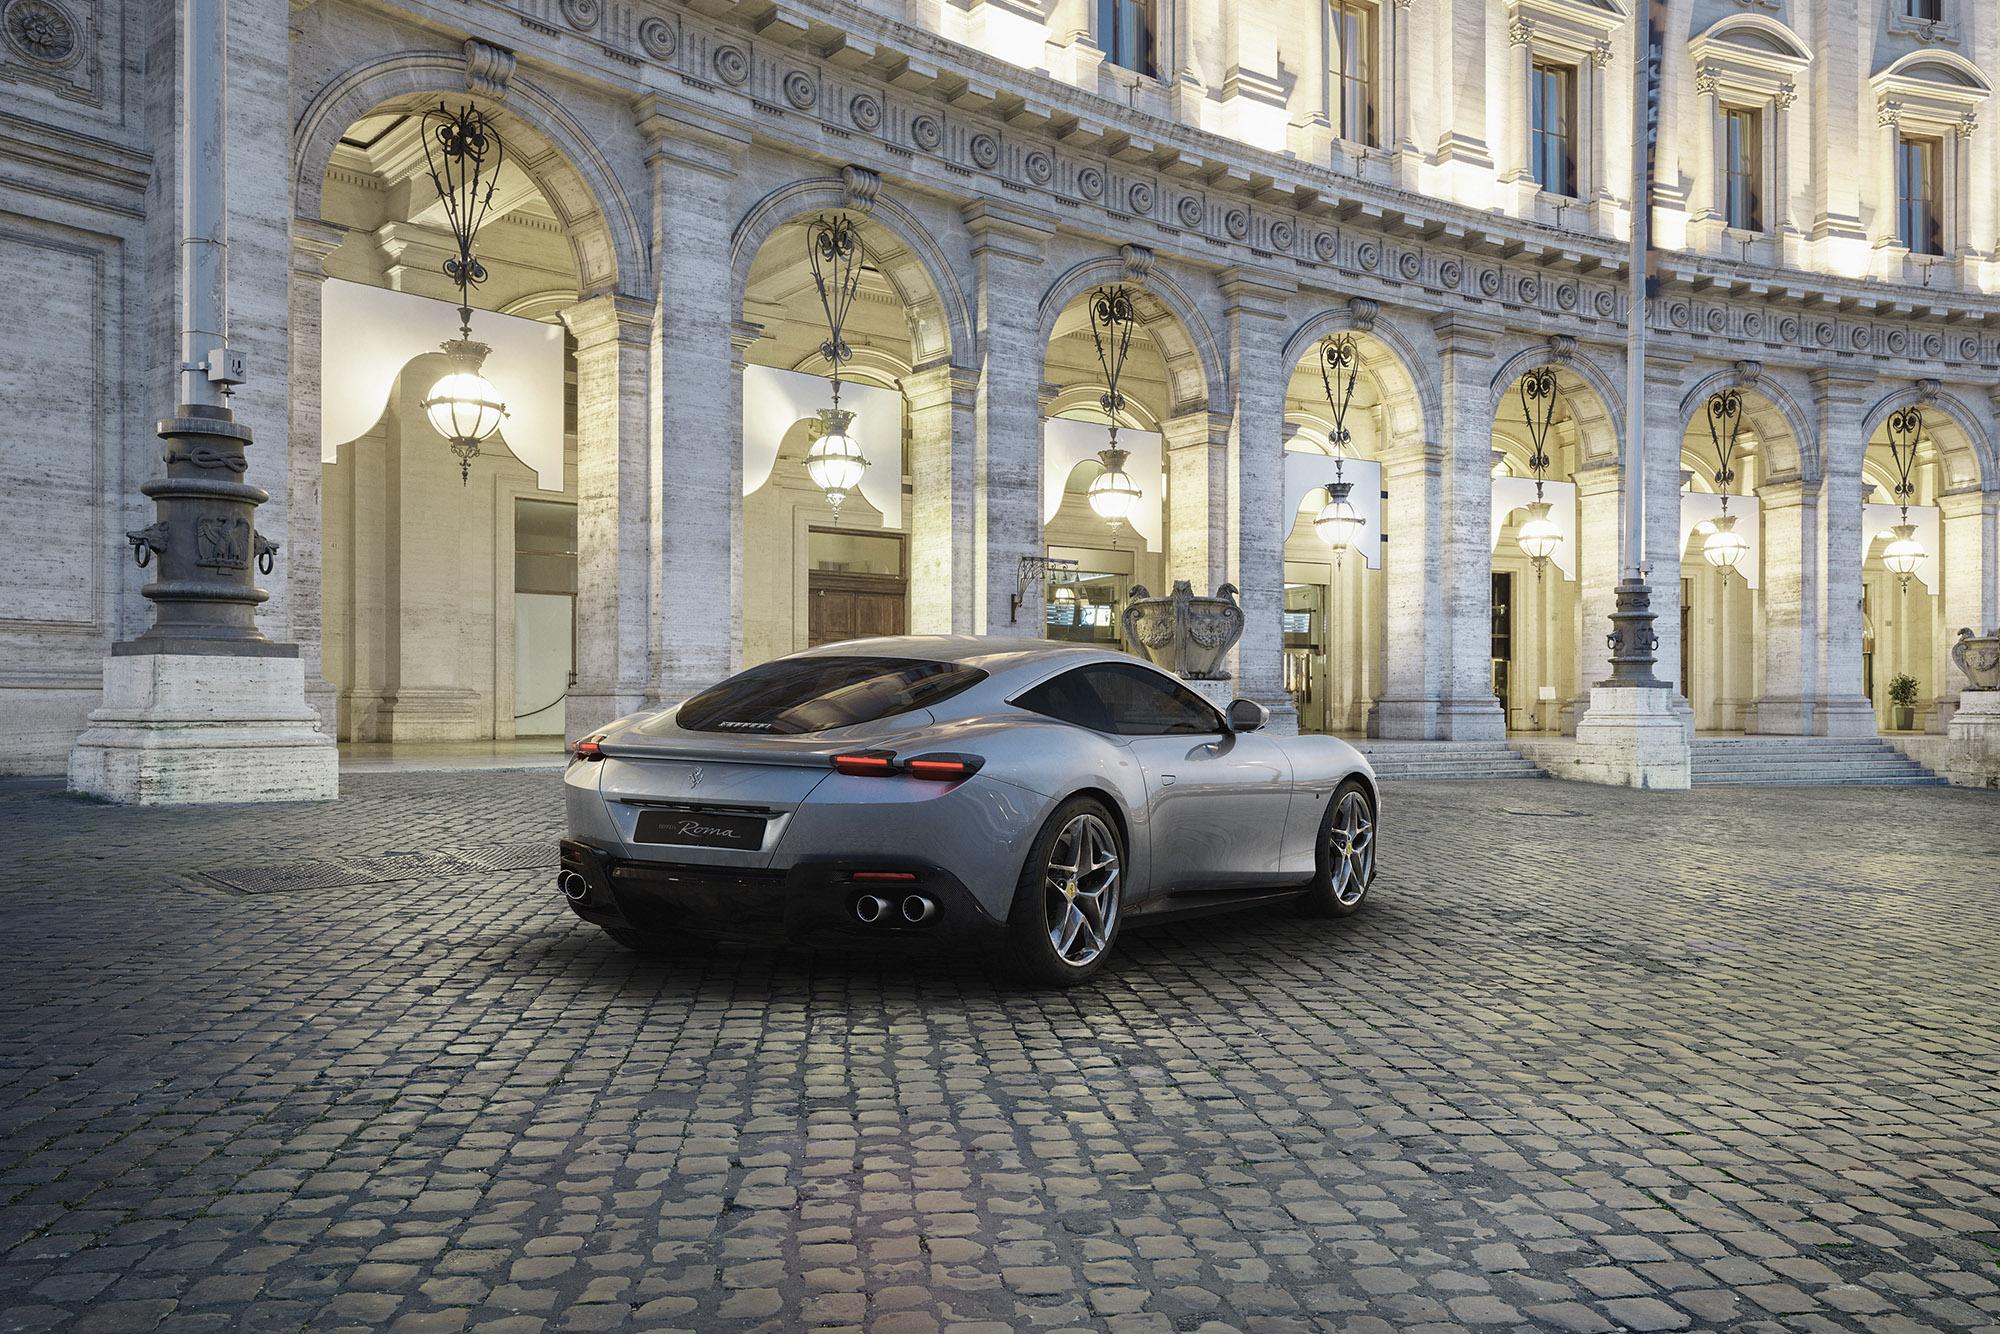 2019 Ferrari Roma rear